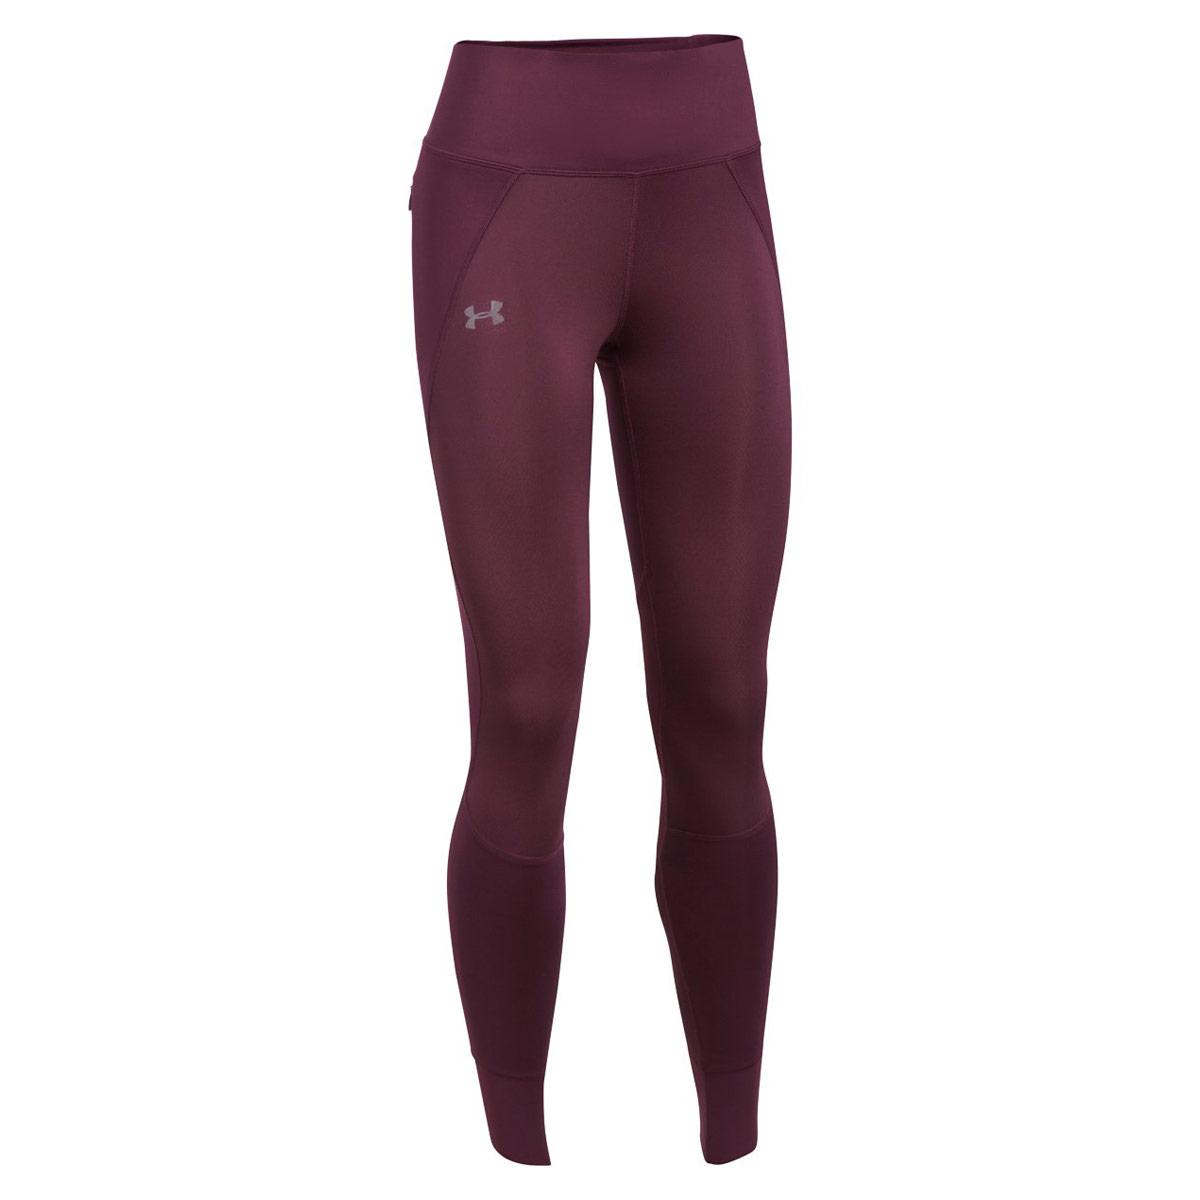 b75c93c138b940 Under Armour ColdGear Reactor Run Leggings - Running trousers for Women -  Red | 21RUN